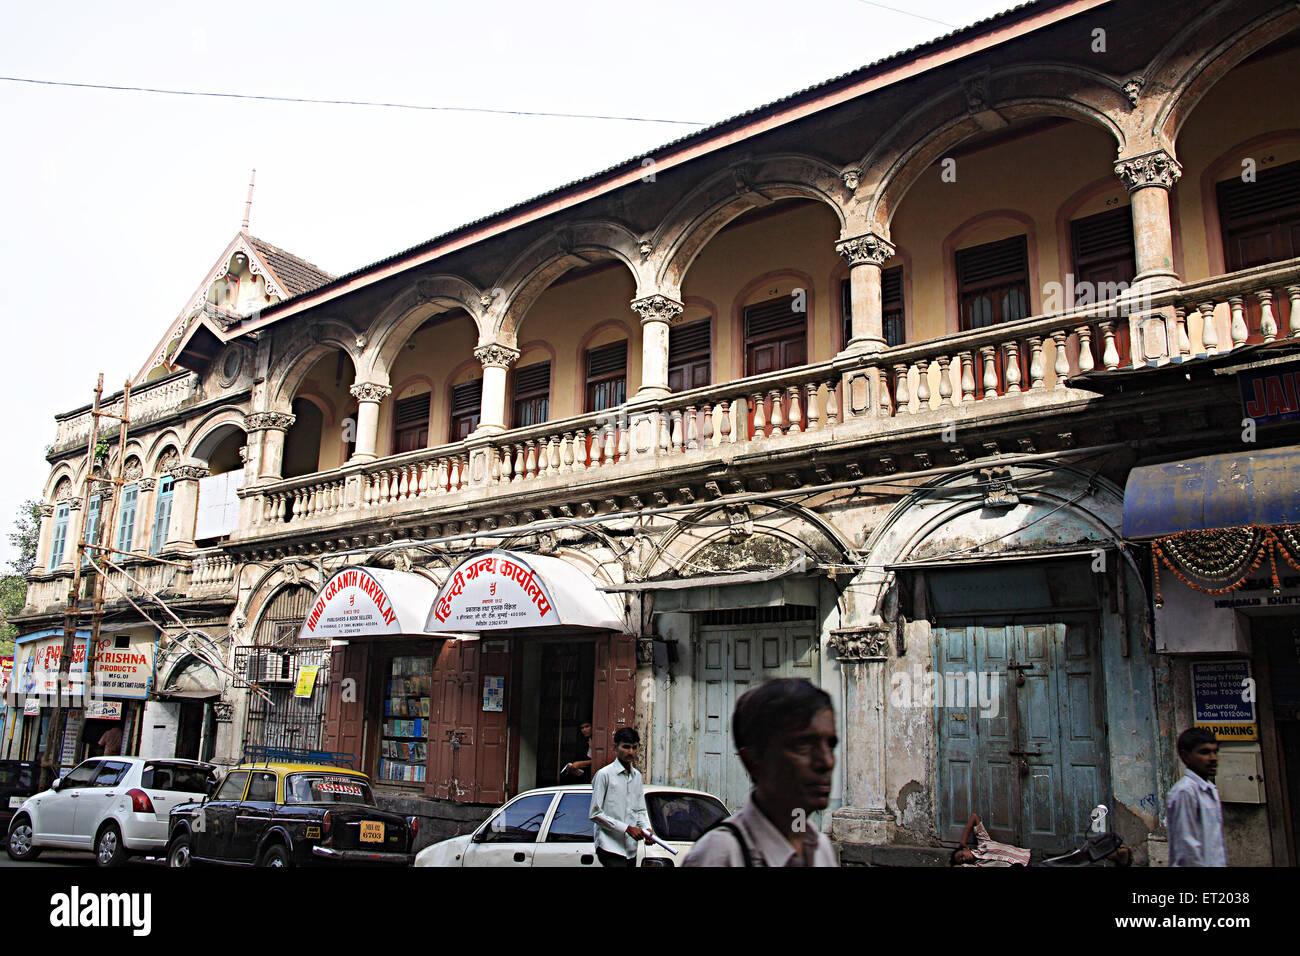 Hira baug seth hirachand gumanji dharamshal building built in 1962 mass urban housing  ; Charni road ; Mumbai ; - Stock Image